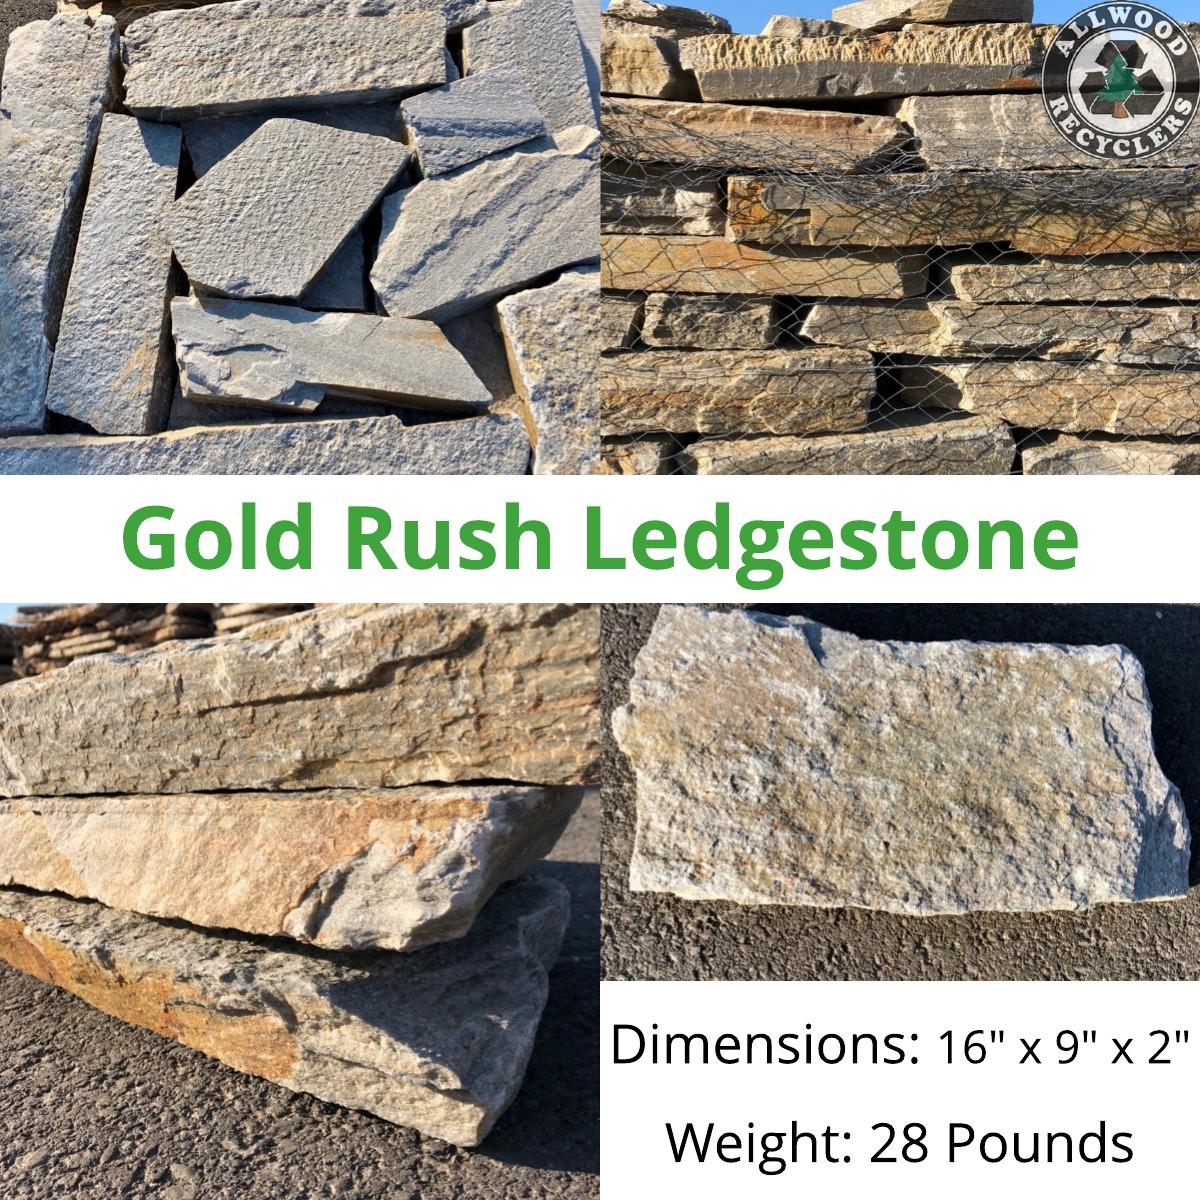 Gold Rush Ledgestone